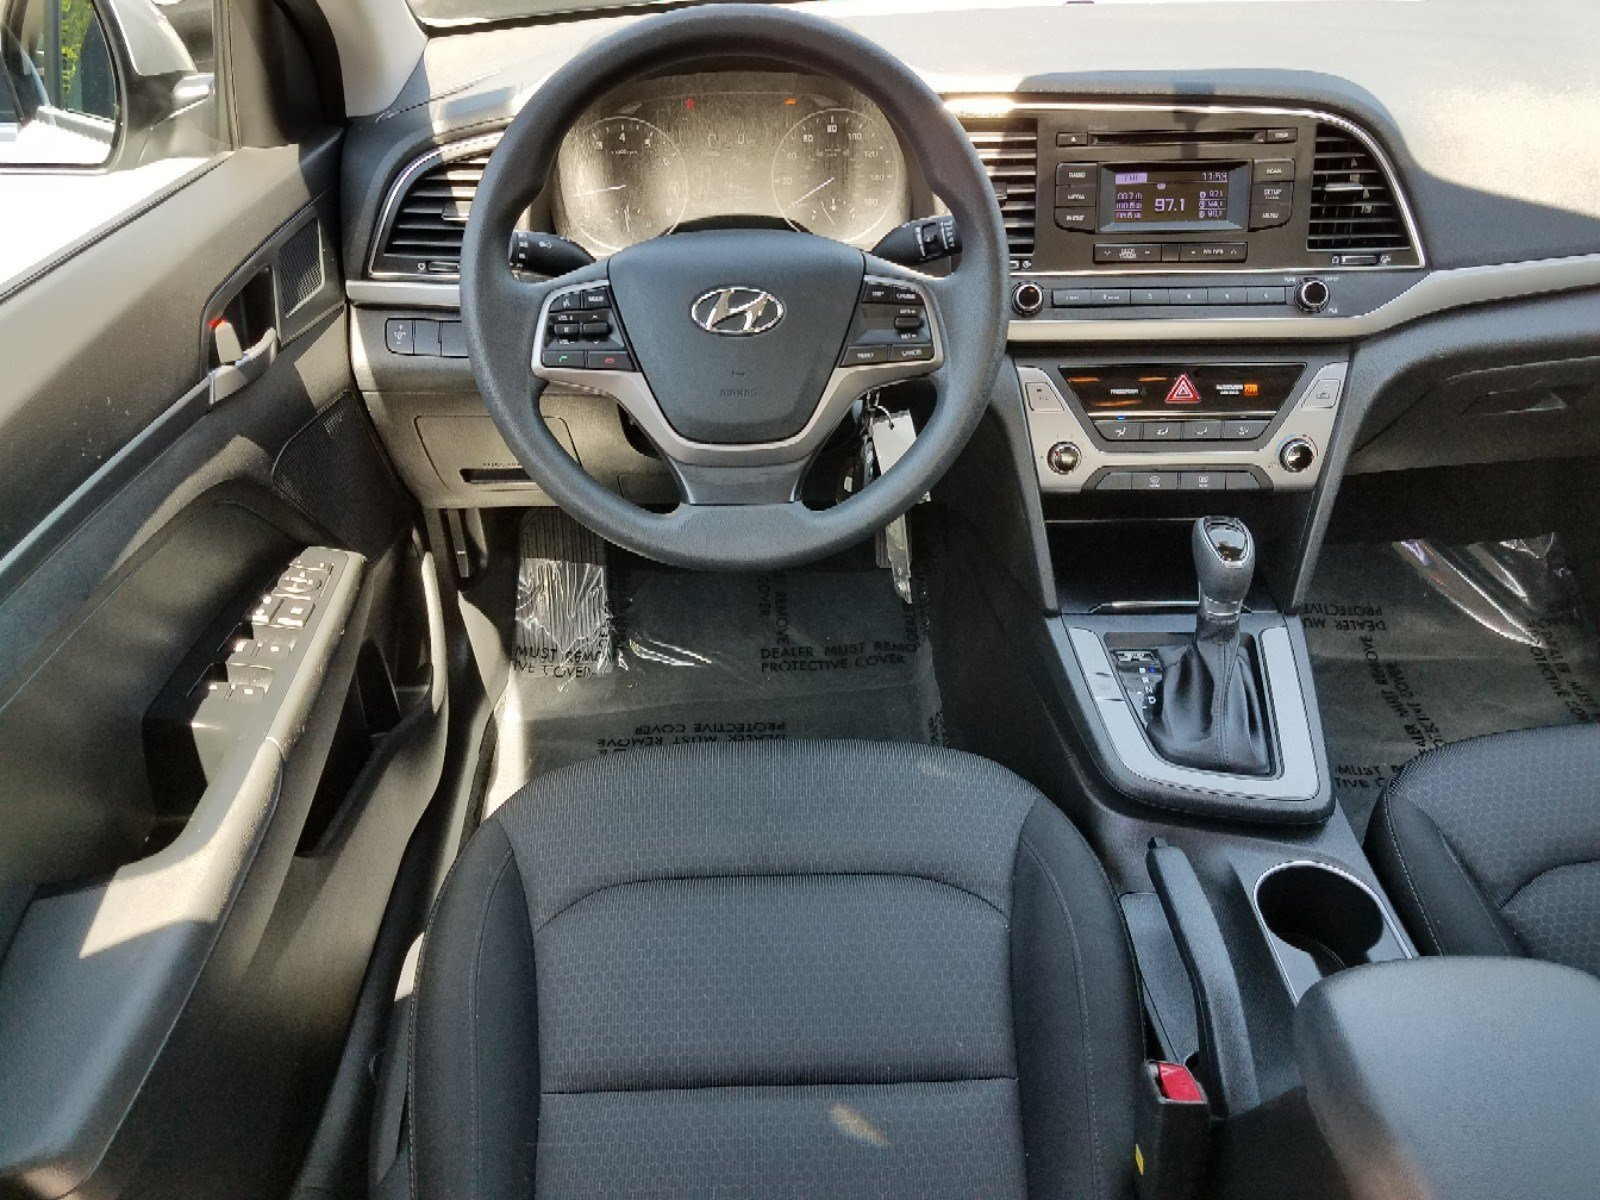 Pre Owned 2018 Hyundai Elantra SE Sedan in Hoover P947455B 1600x1200